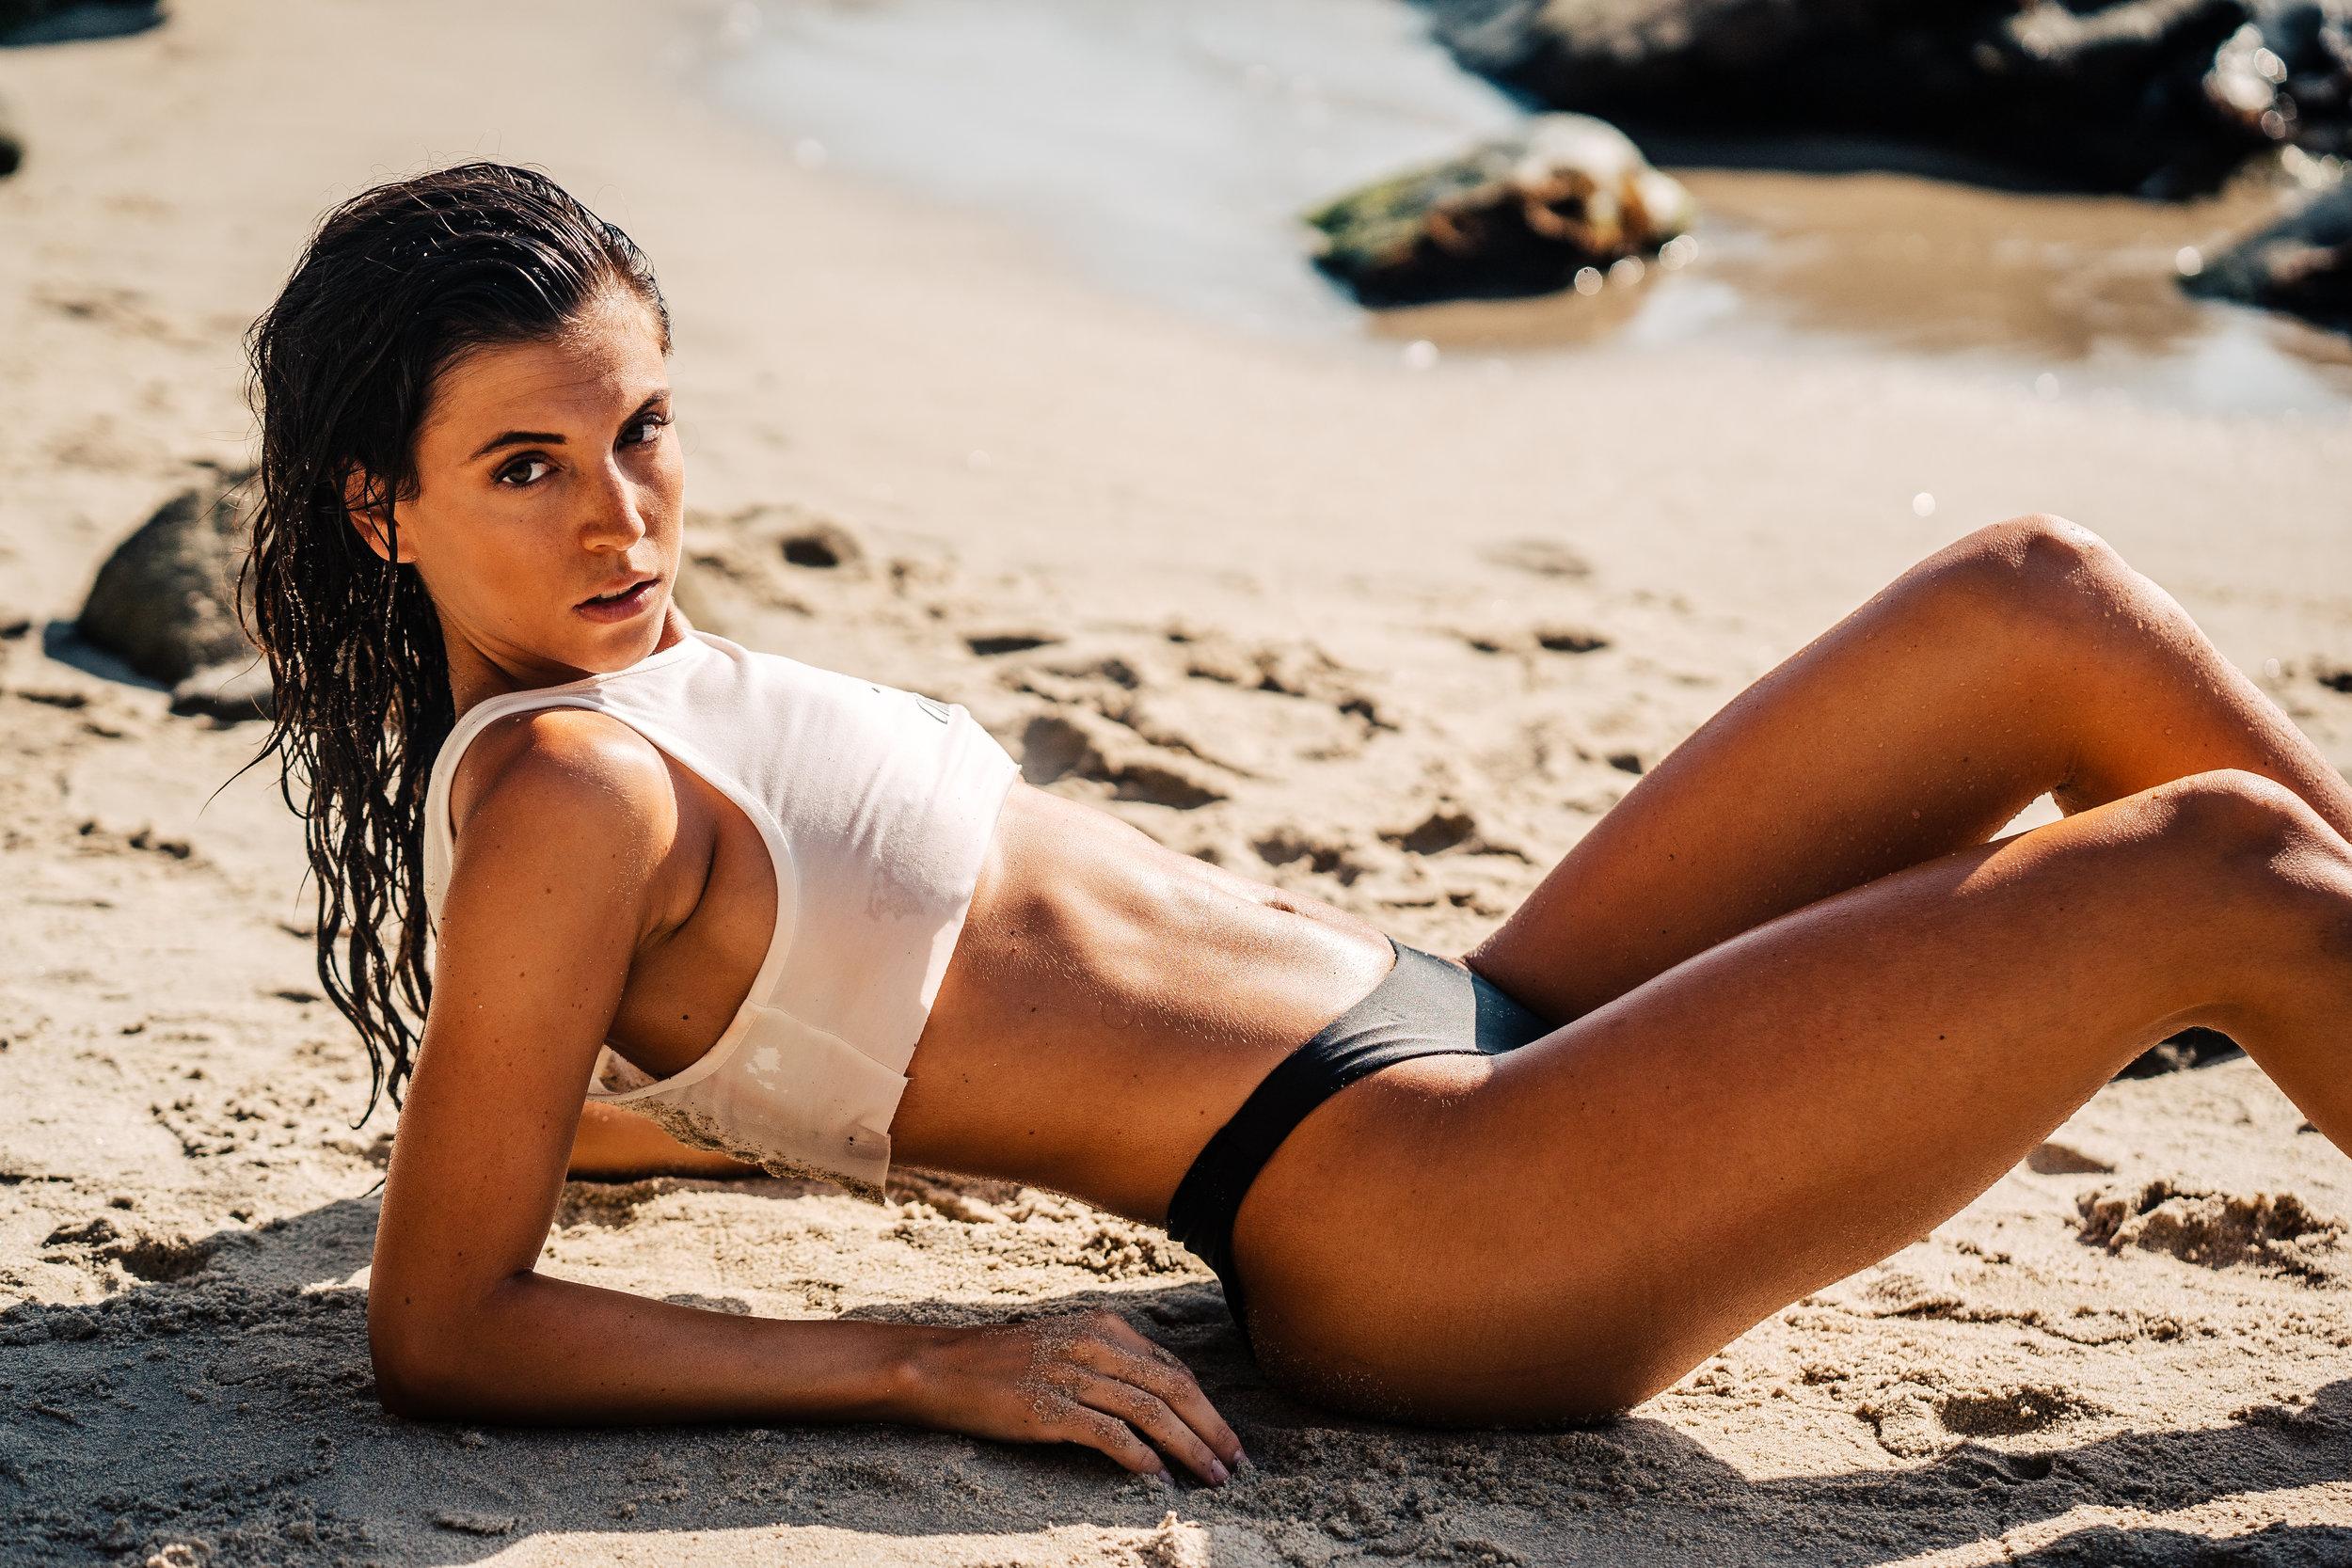 @ella.jordan |@thenobraclub  Moss Street Beach - Laguna Beach, CALIFORNIa